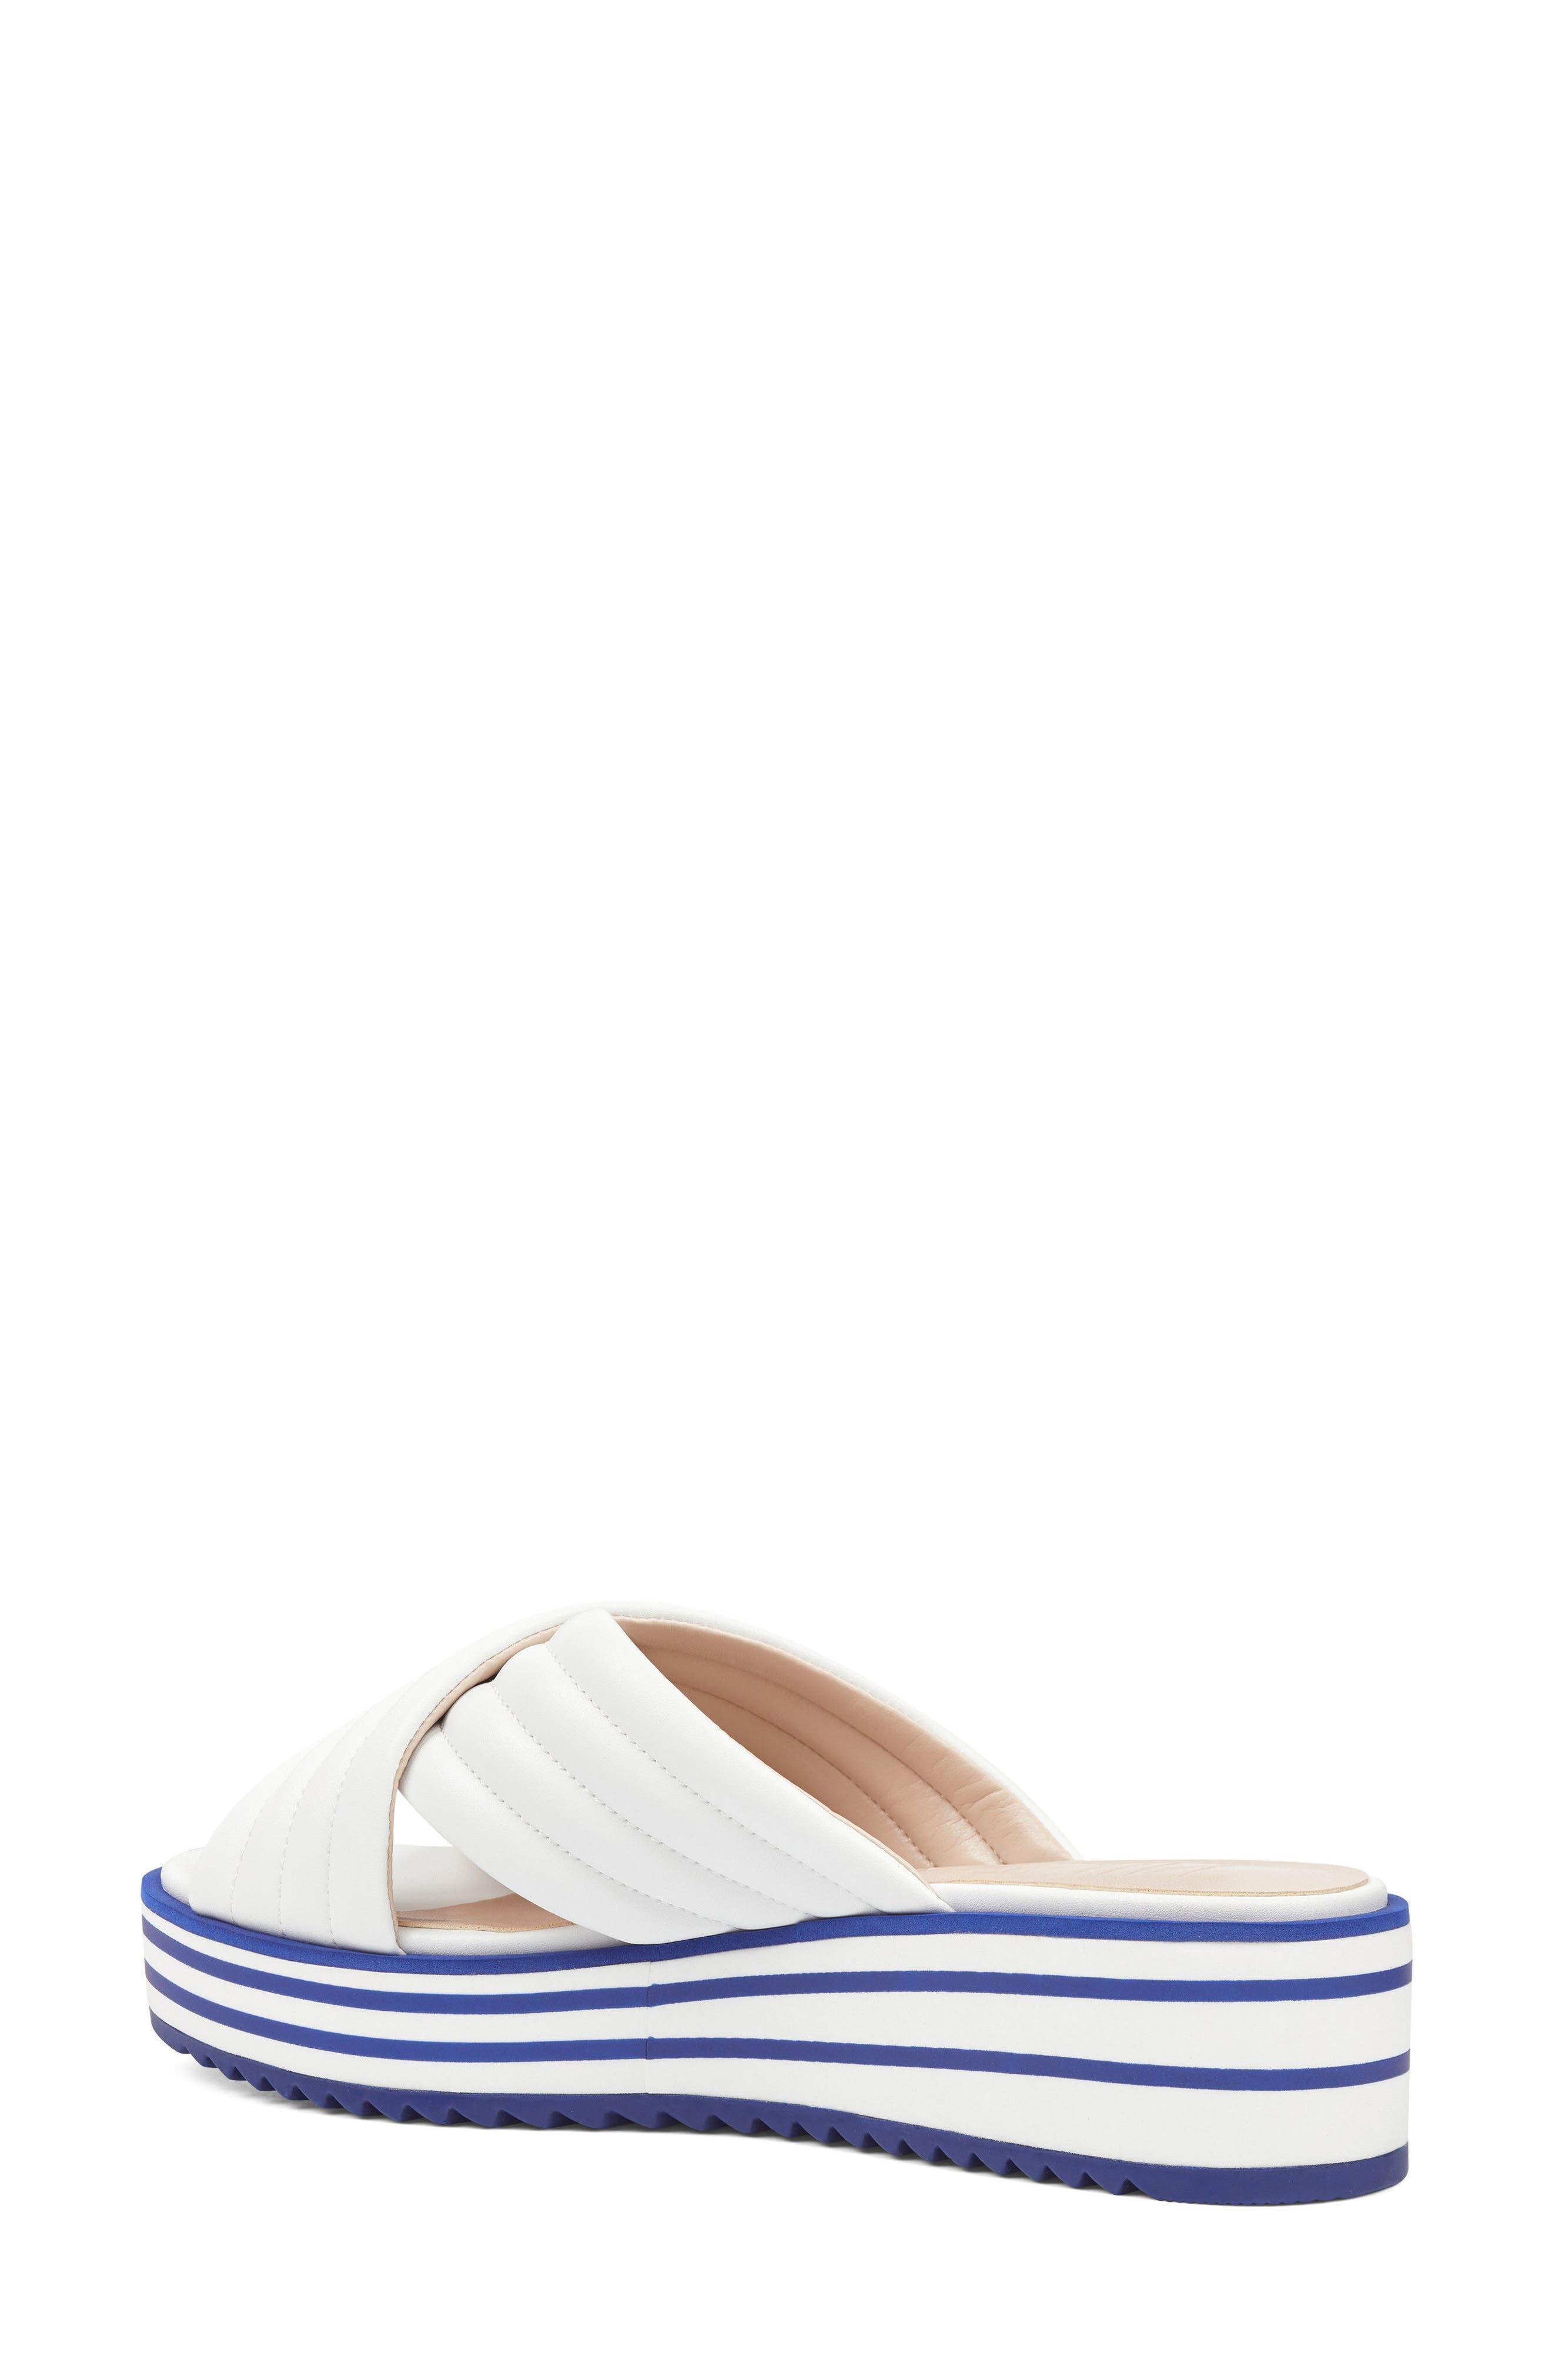 Zonita Platform Slide Sandal,                             Alternate thumbnail 6, color,